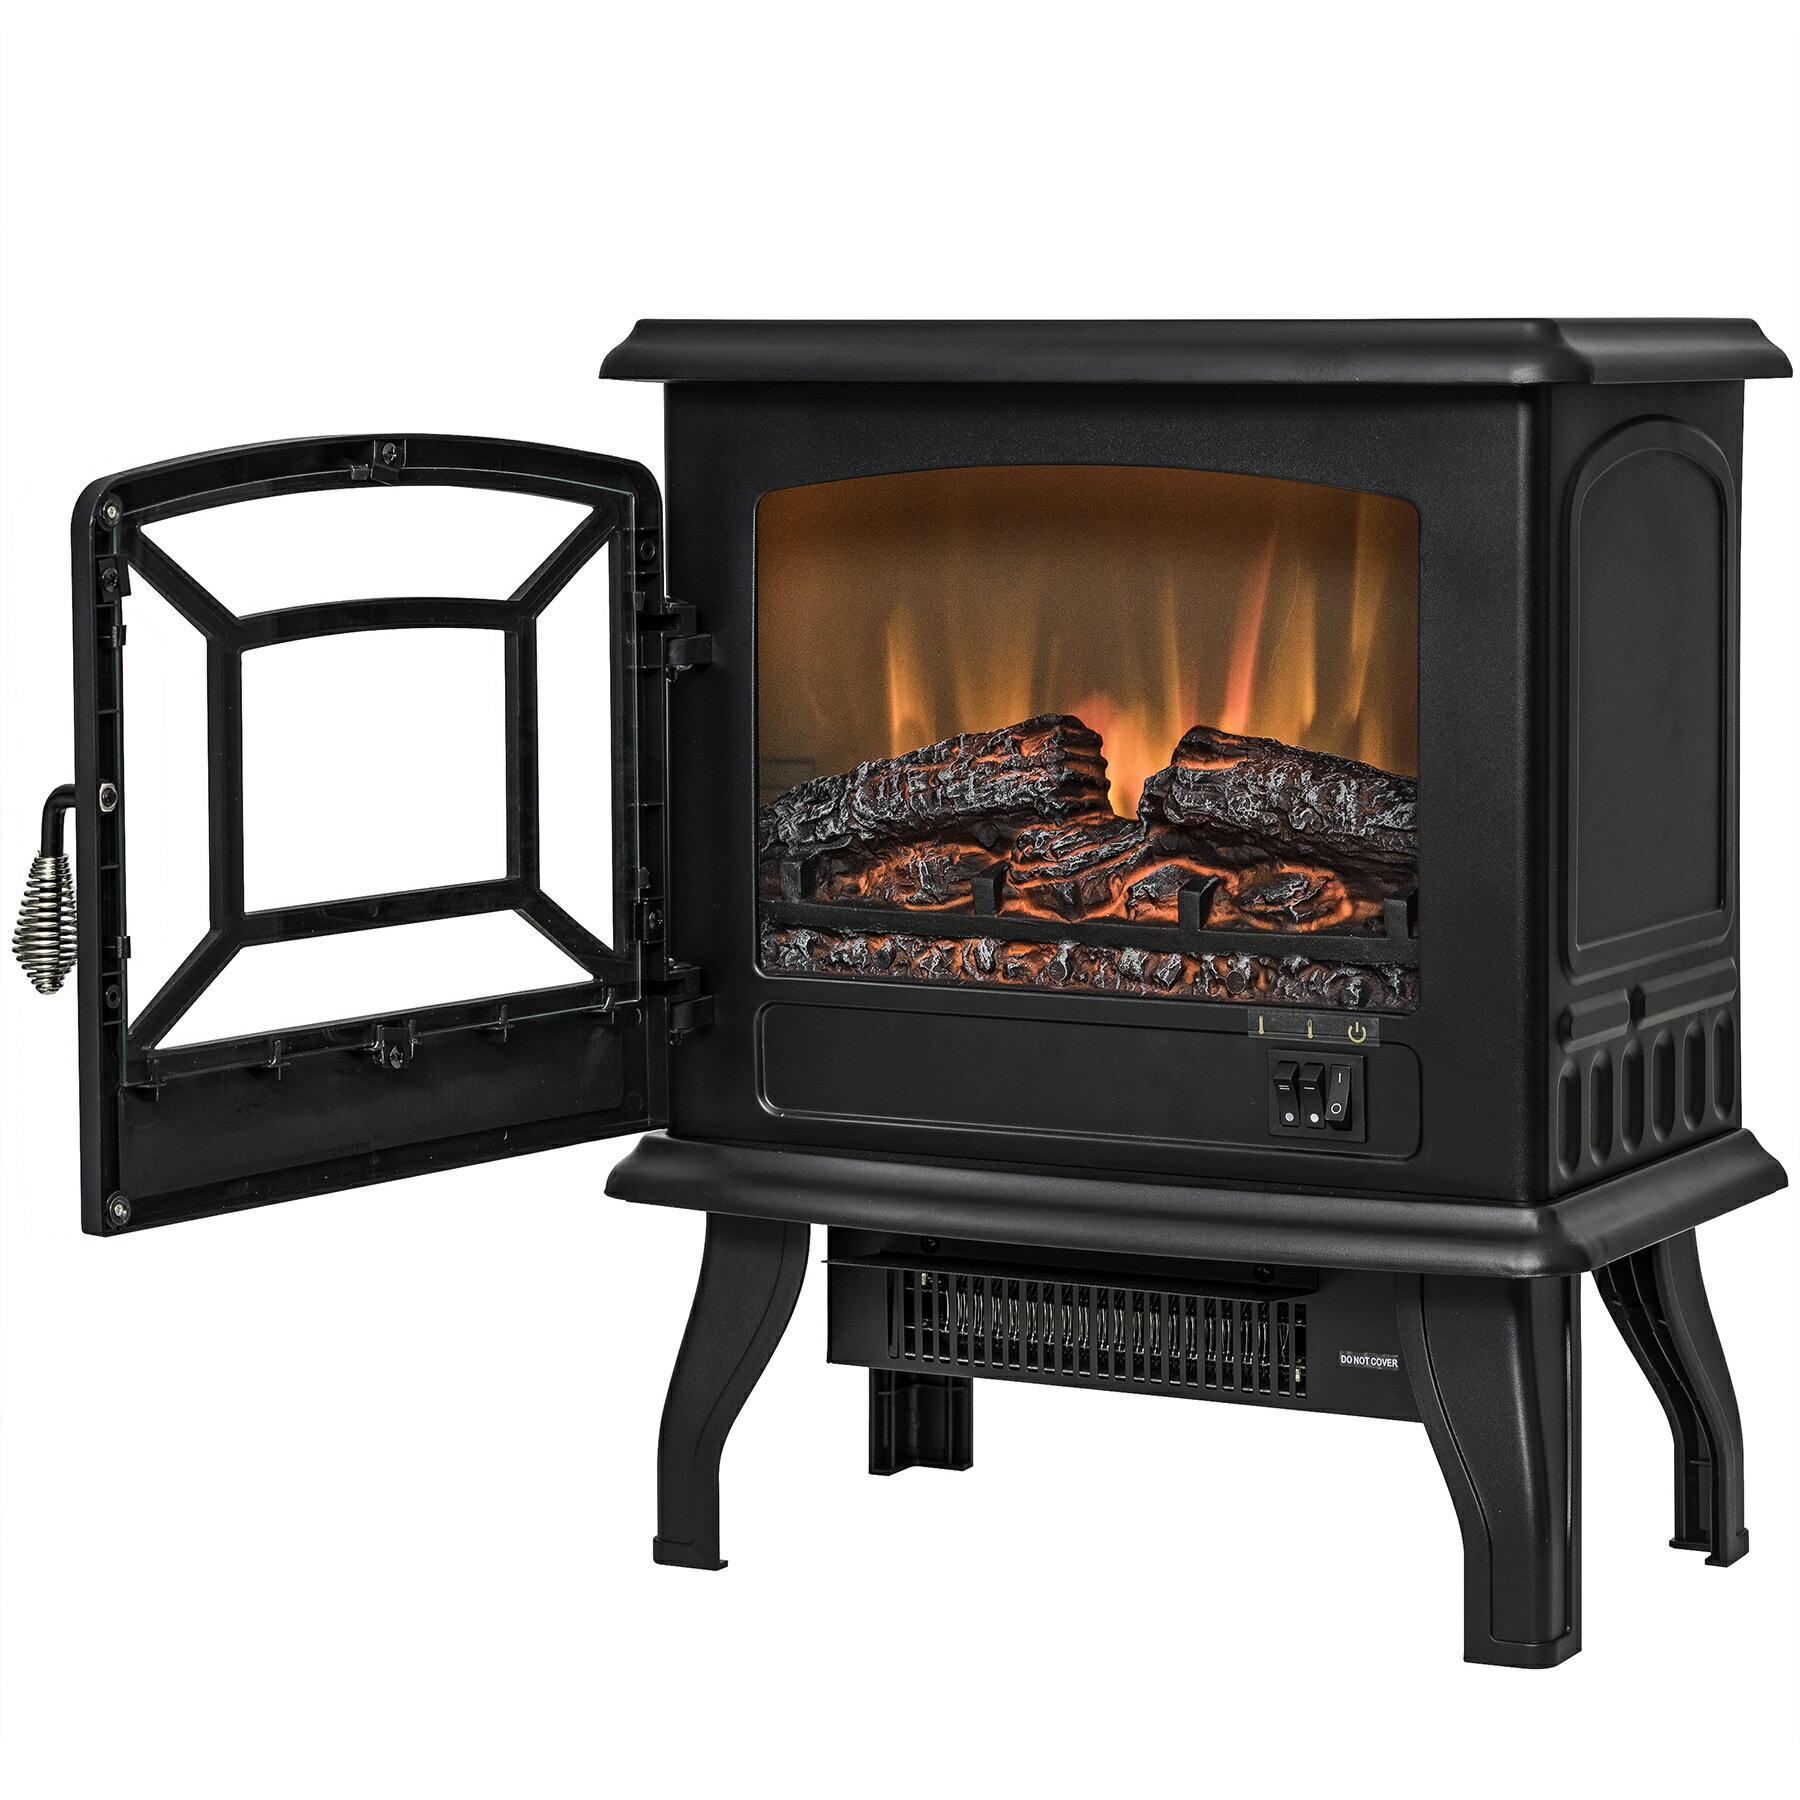 "AKDY 17"" Black Finish Freestanding Portable Electric Fireplace Heater 2 Setting Level 3"